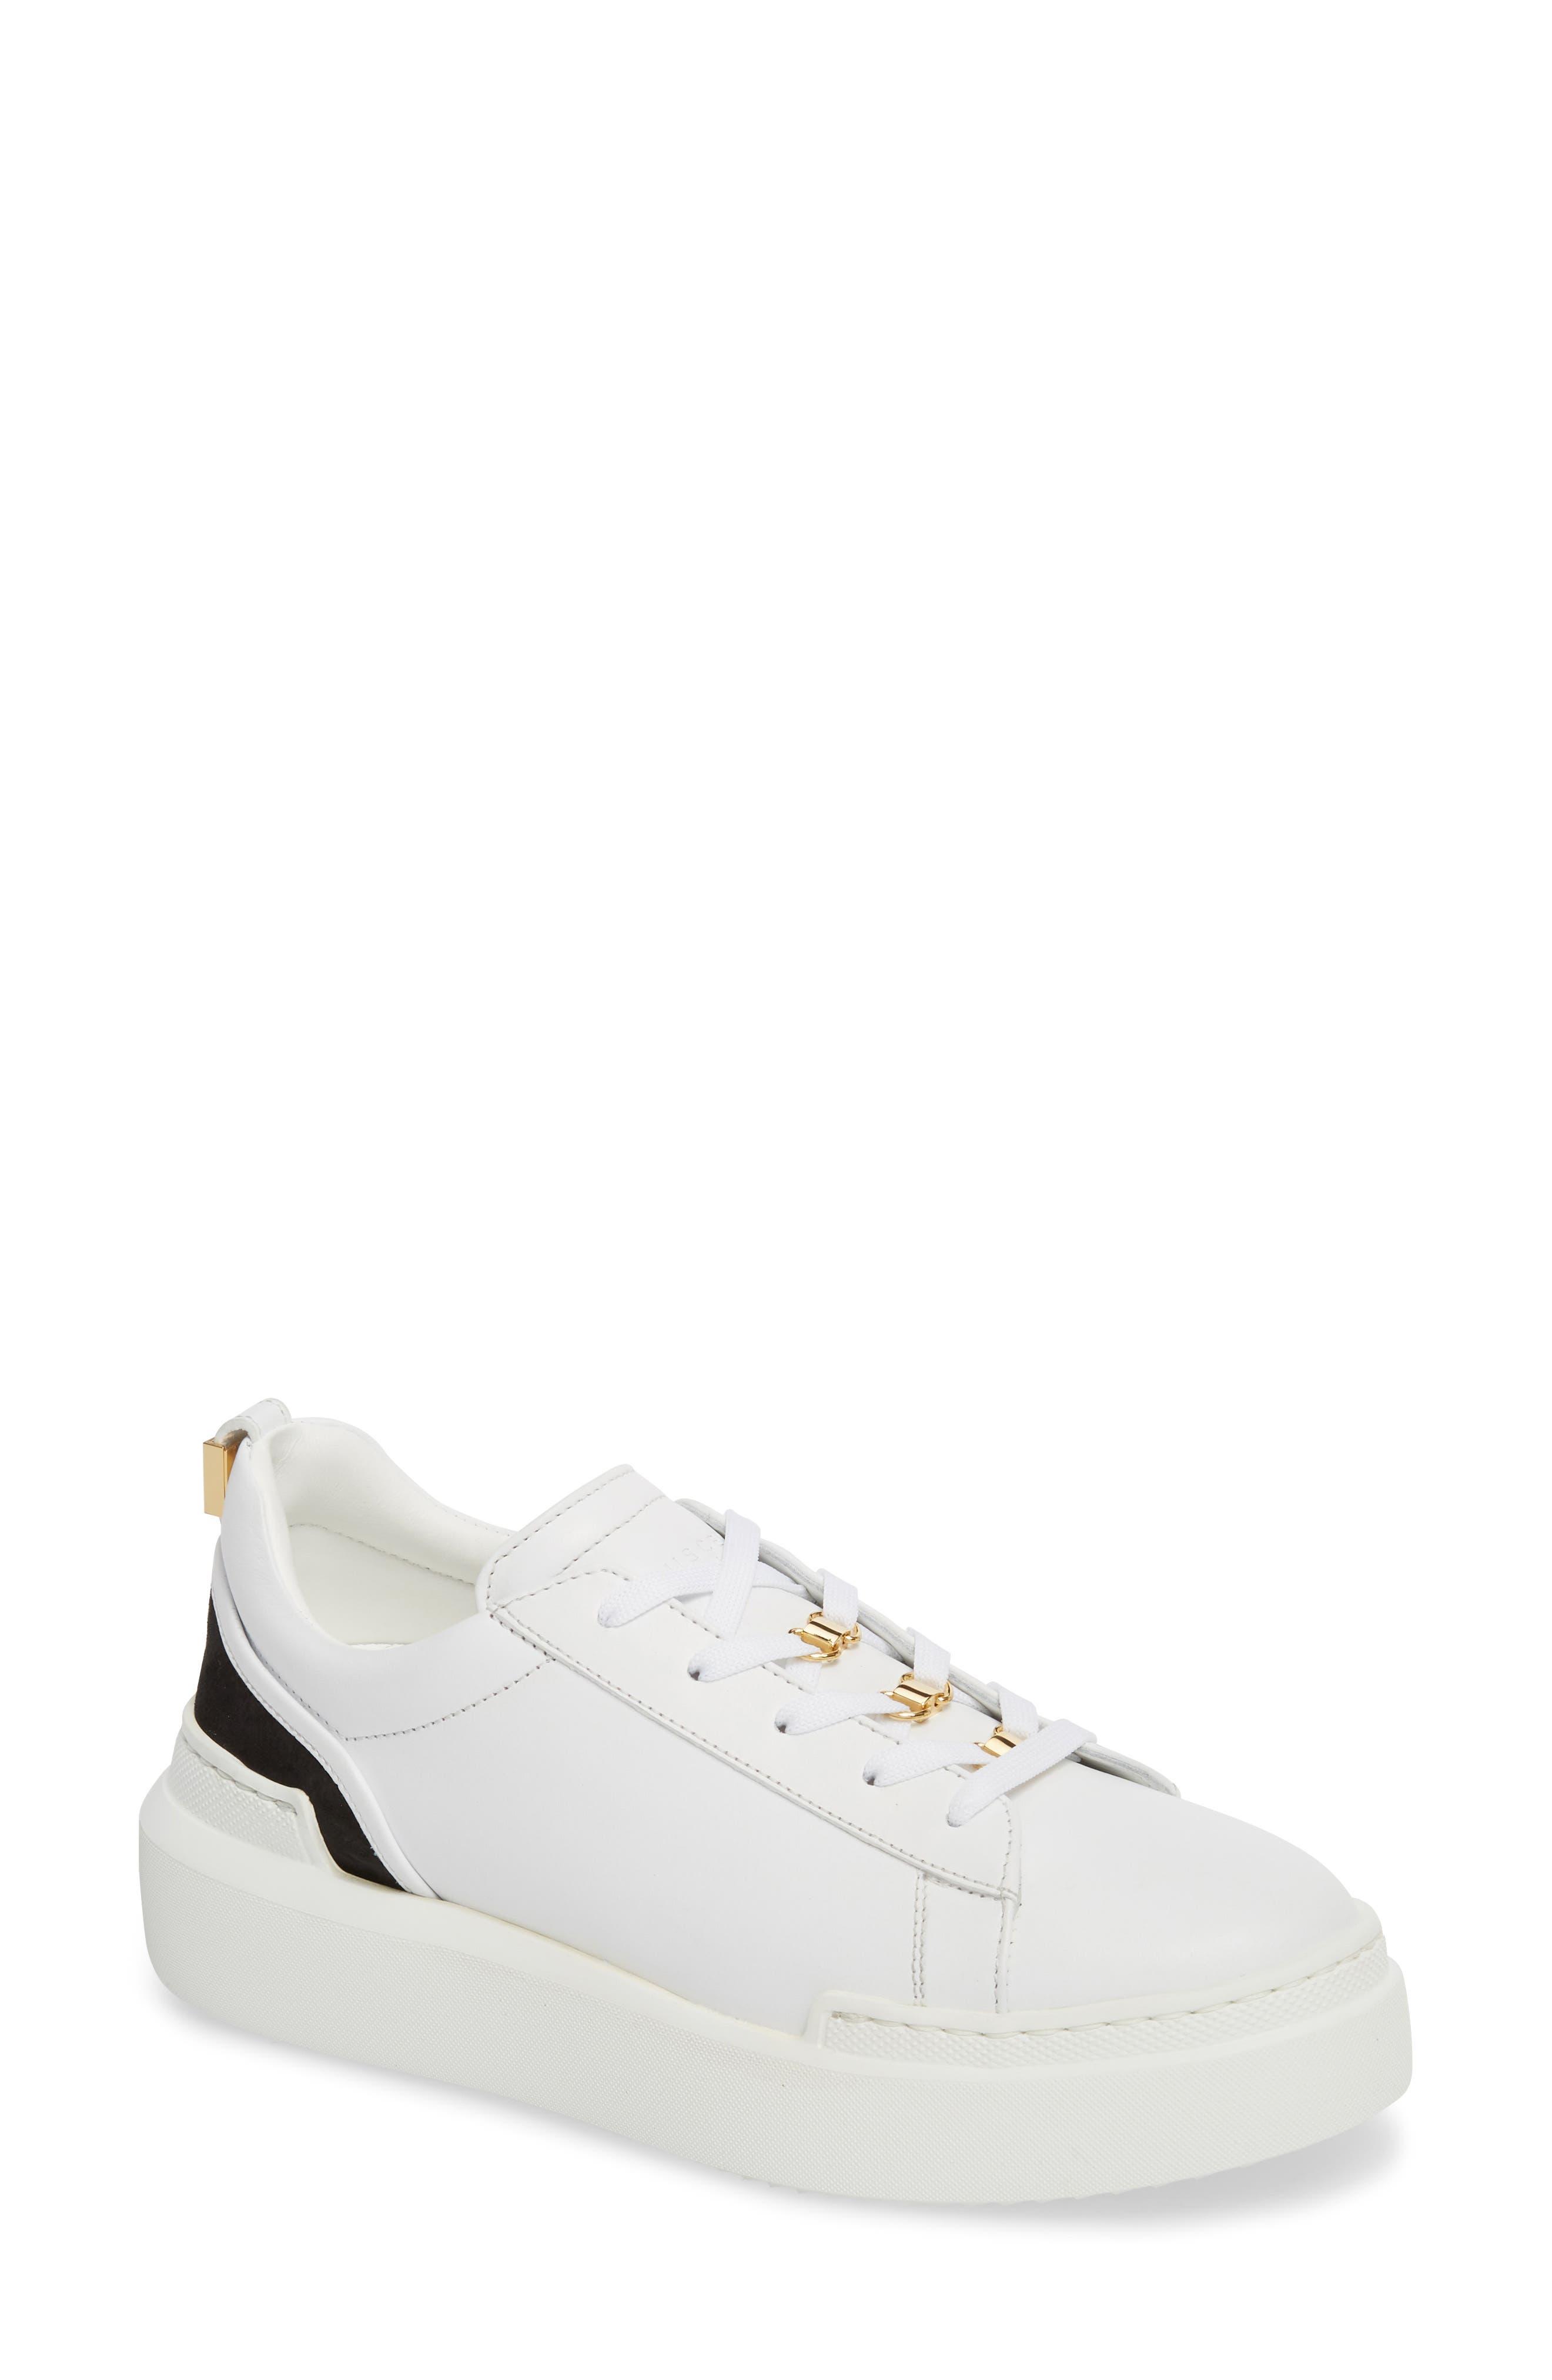 Acne Studios White Leni Sneakers AKa15QFAPS